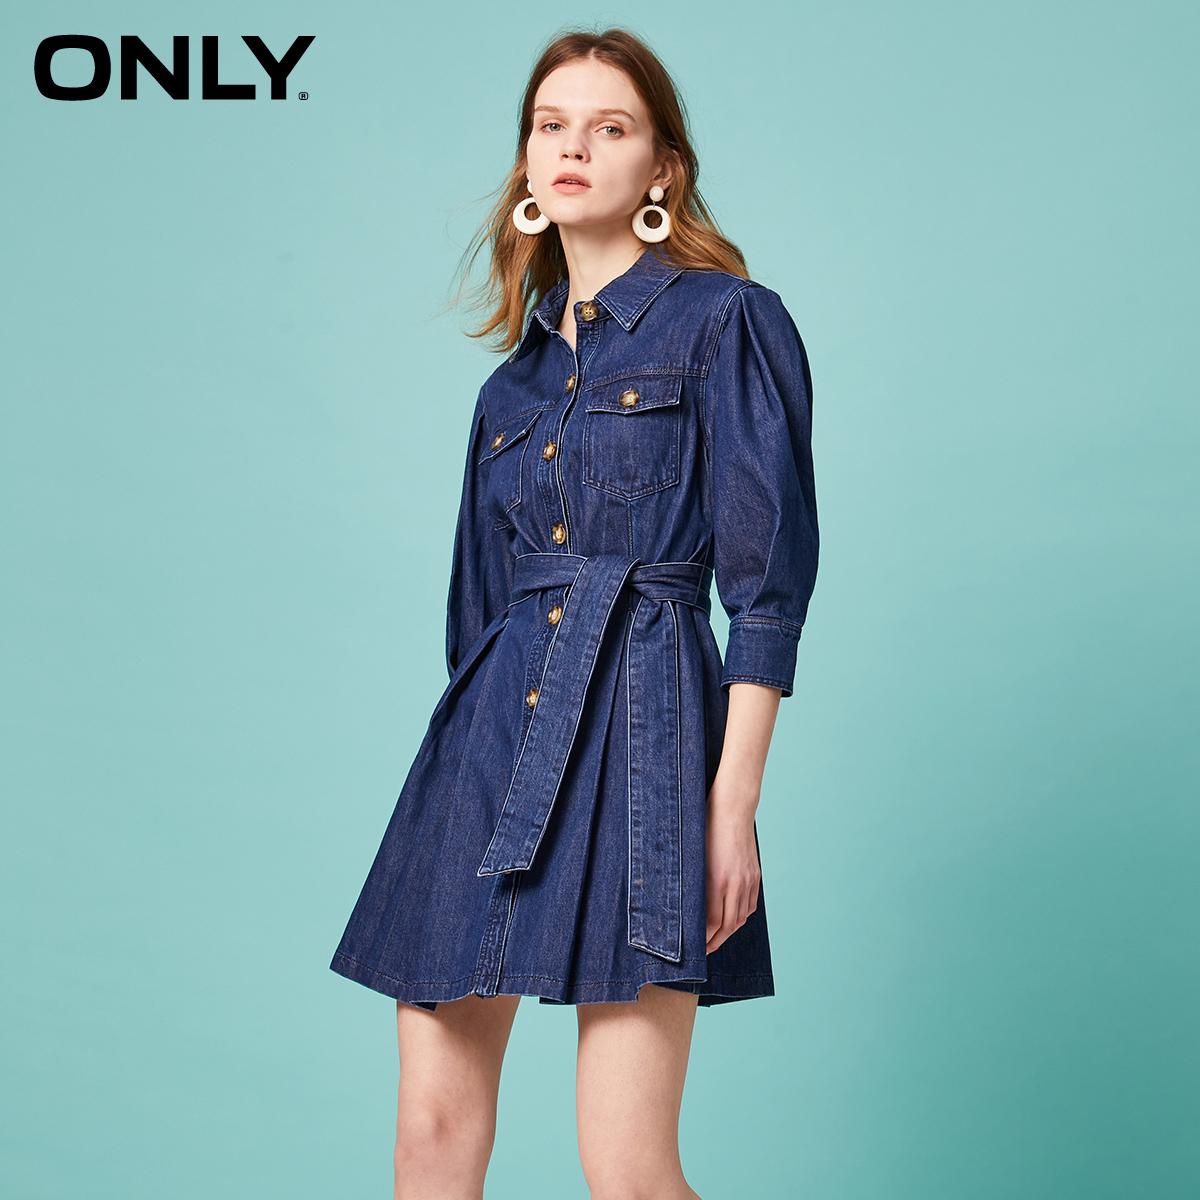 ONLY2020夏季新款A字短款轻熟风小个子牛仔连衣裙女 120142508